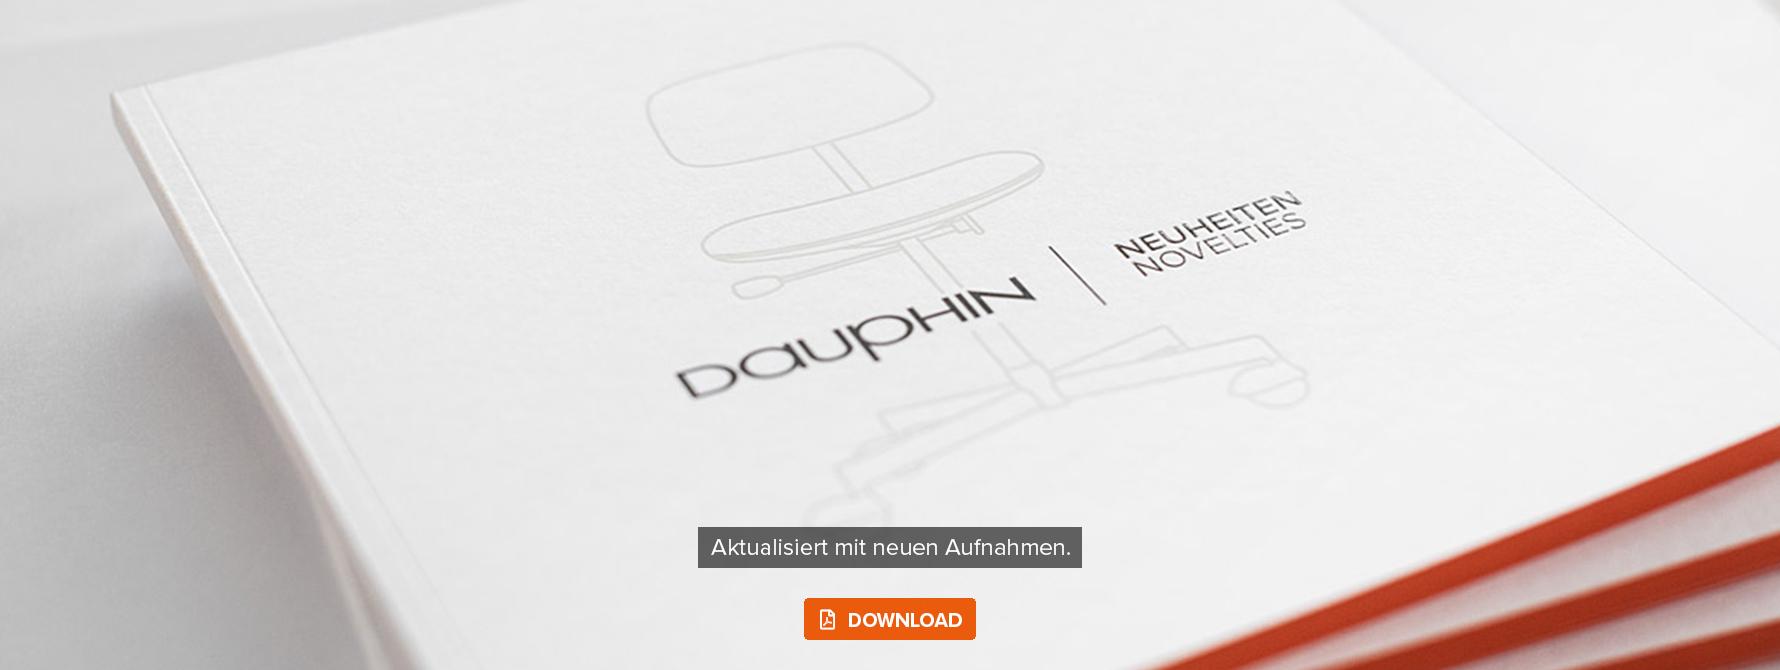 Dauphin Humandesign Group